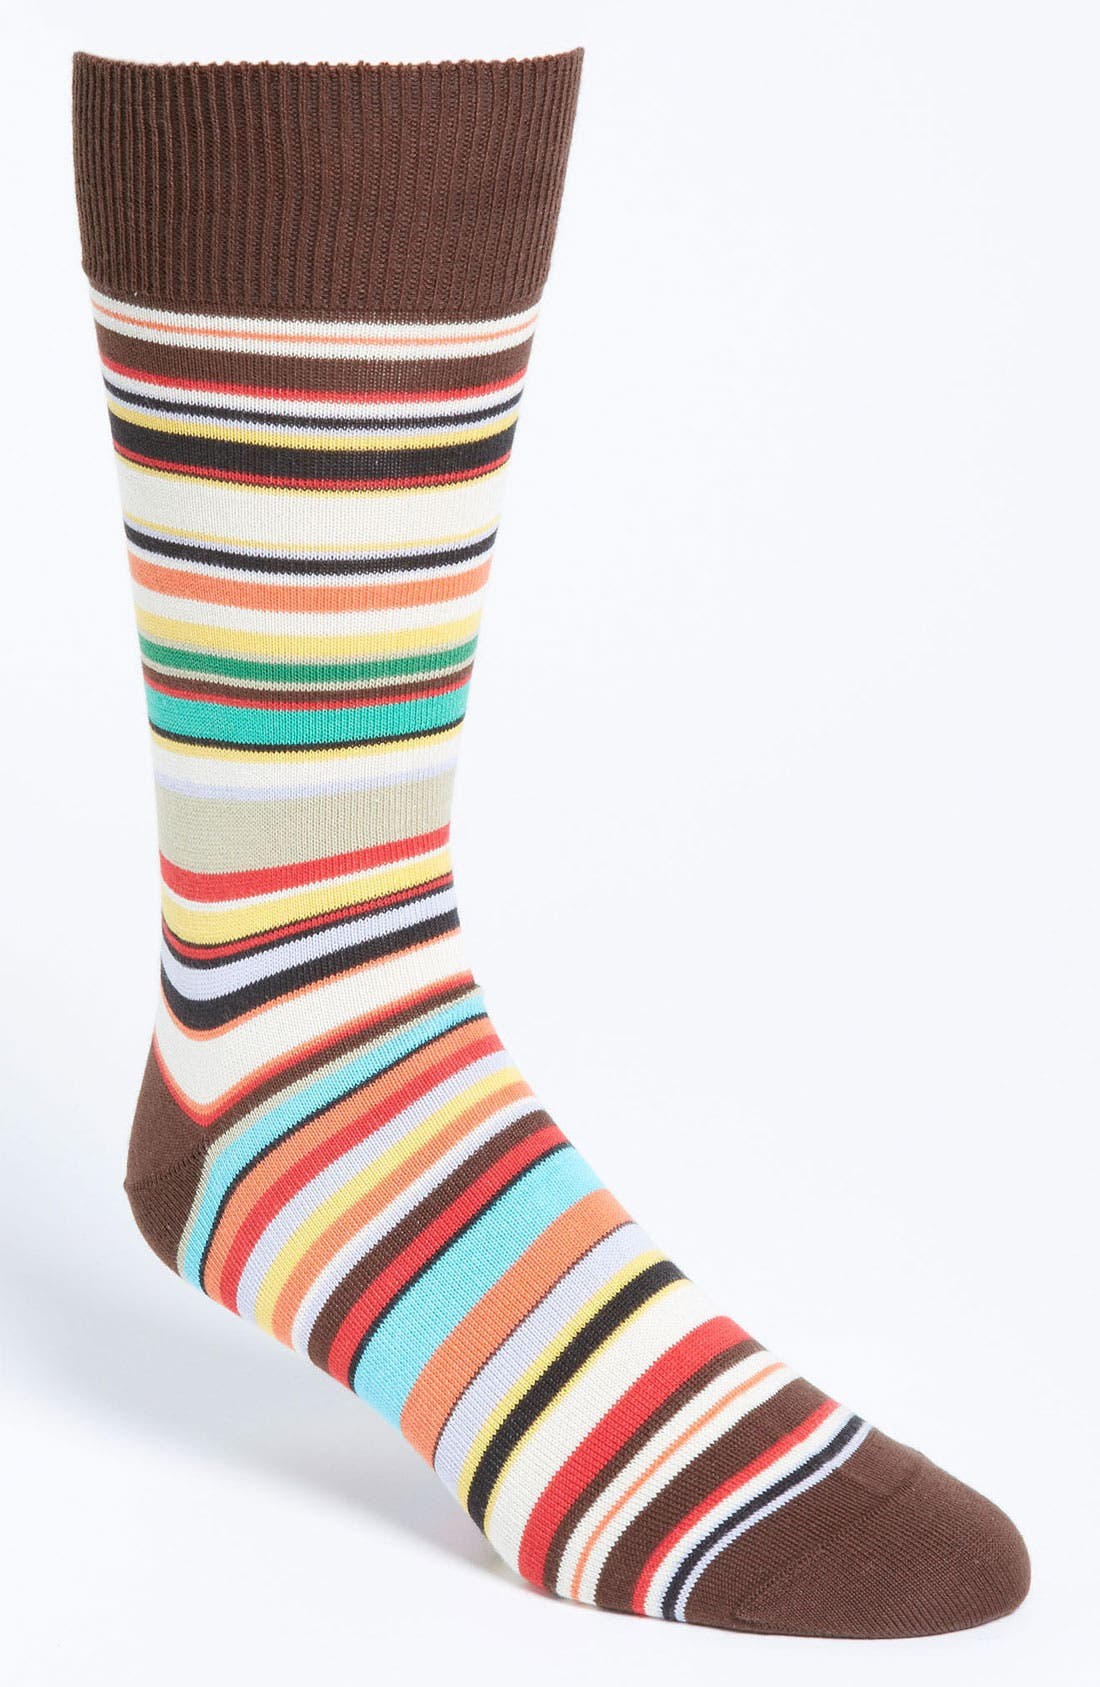 Main Image - Paul Smith Accessories Multi Stripe Socks